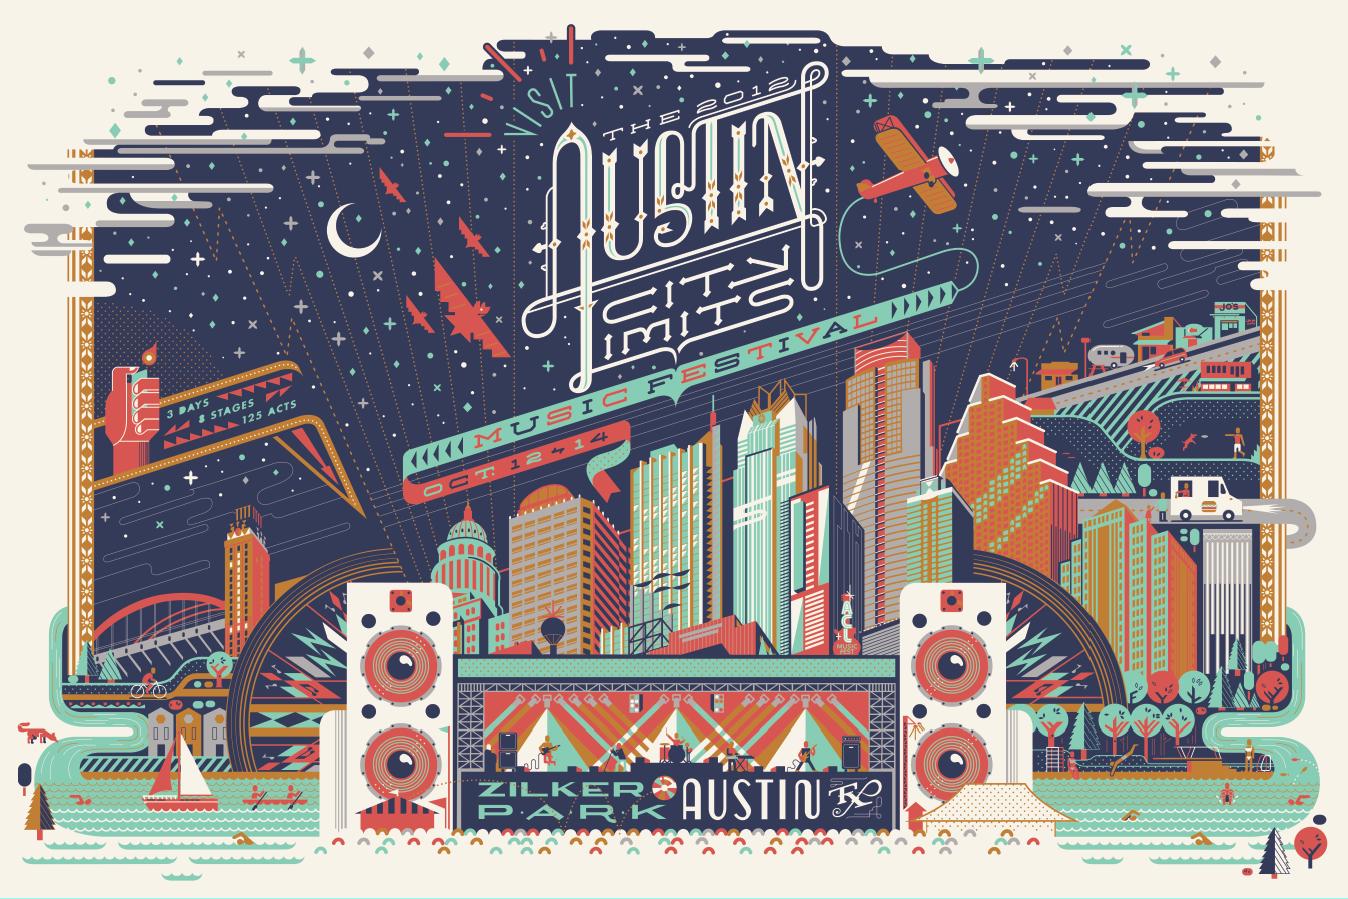 Anderson design group blog 2012 austin city limits music for Brochure design austin